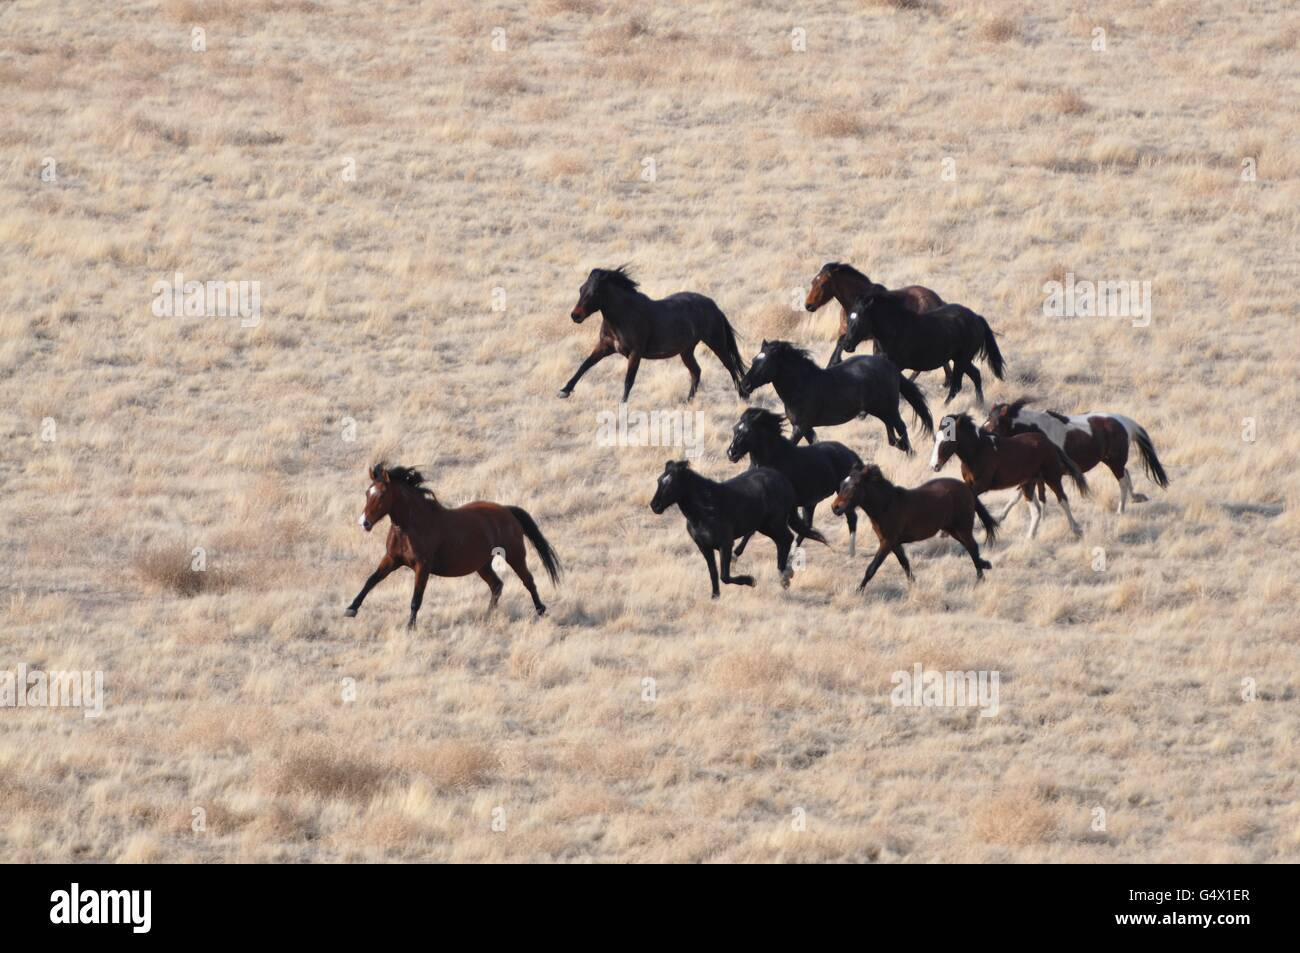 Wild Horse Herd Running At The Onaqui Herd Management Area February Stock Photo Alamy